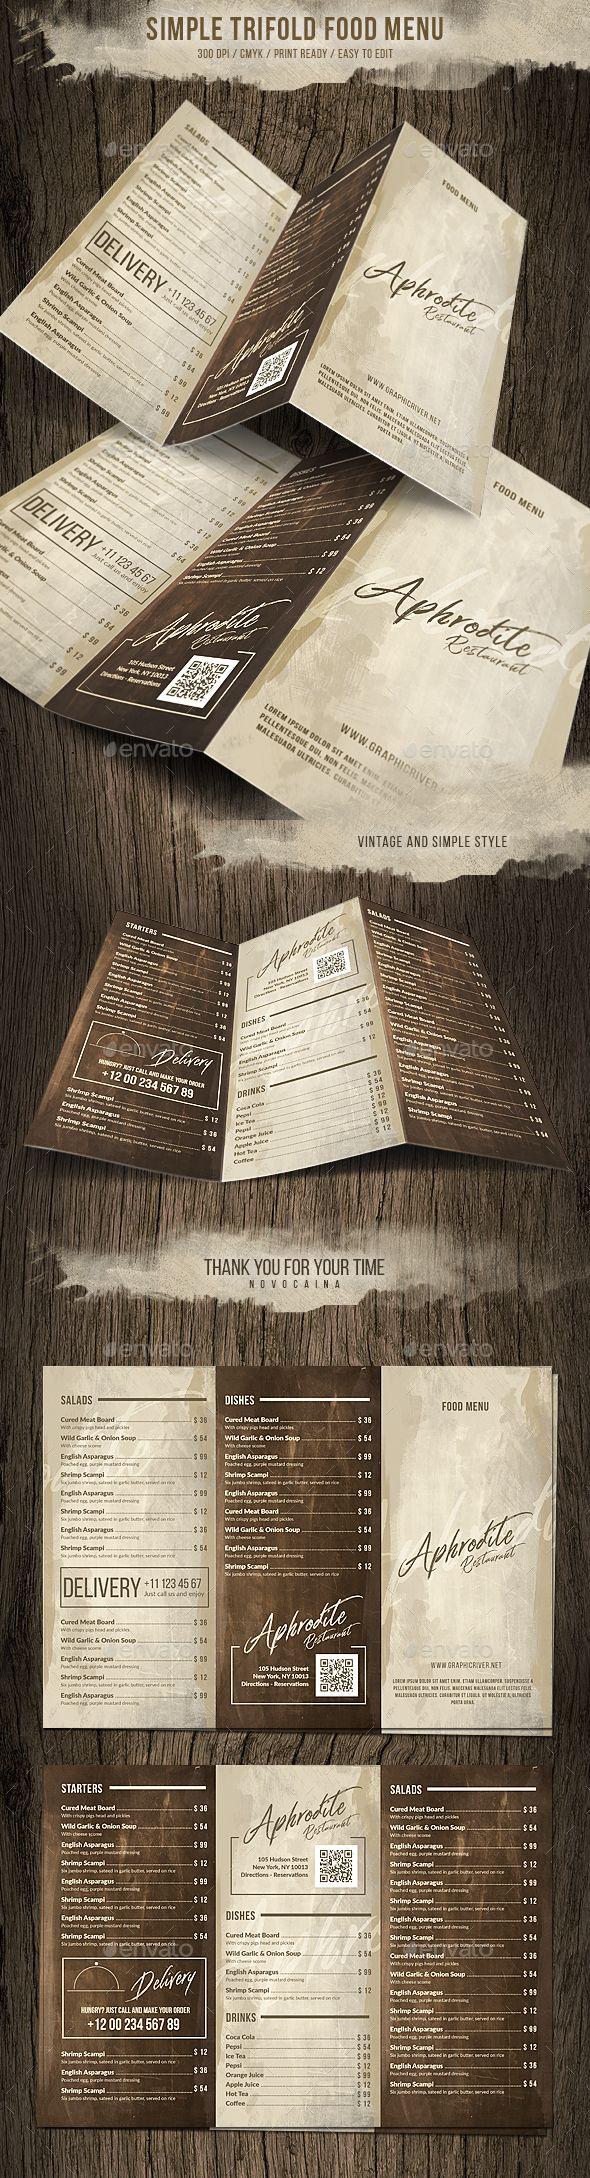 Simple Style Trifold Menu Design — Photoshop PSD #blackboard #restaurant • Download ➝ https://graphicriver.net/item/simple-style-trifold-menu-design/20277015?ref=pxcr